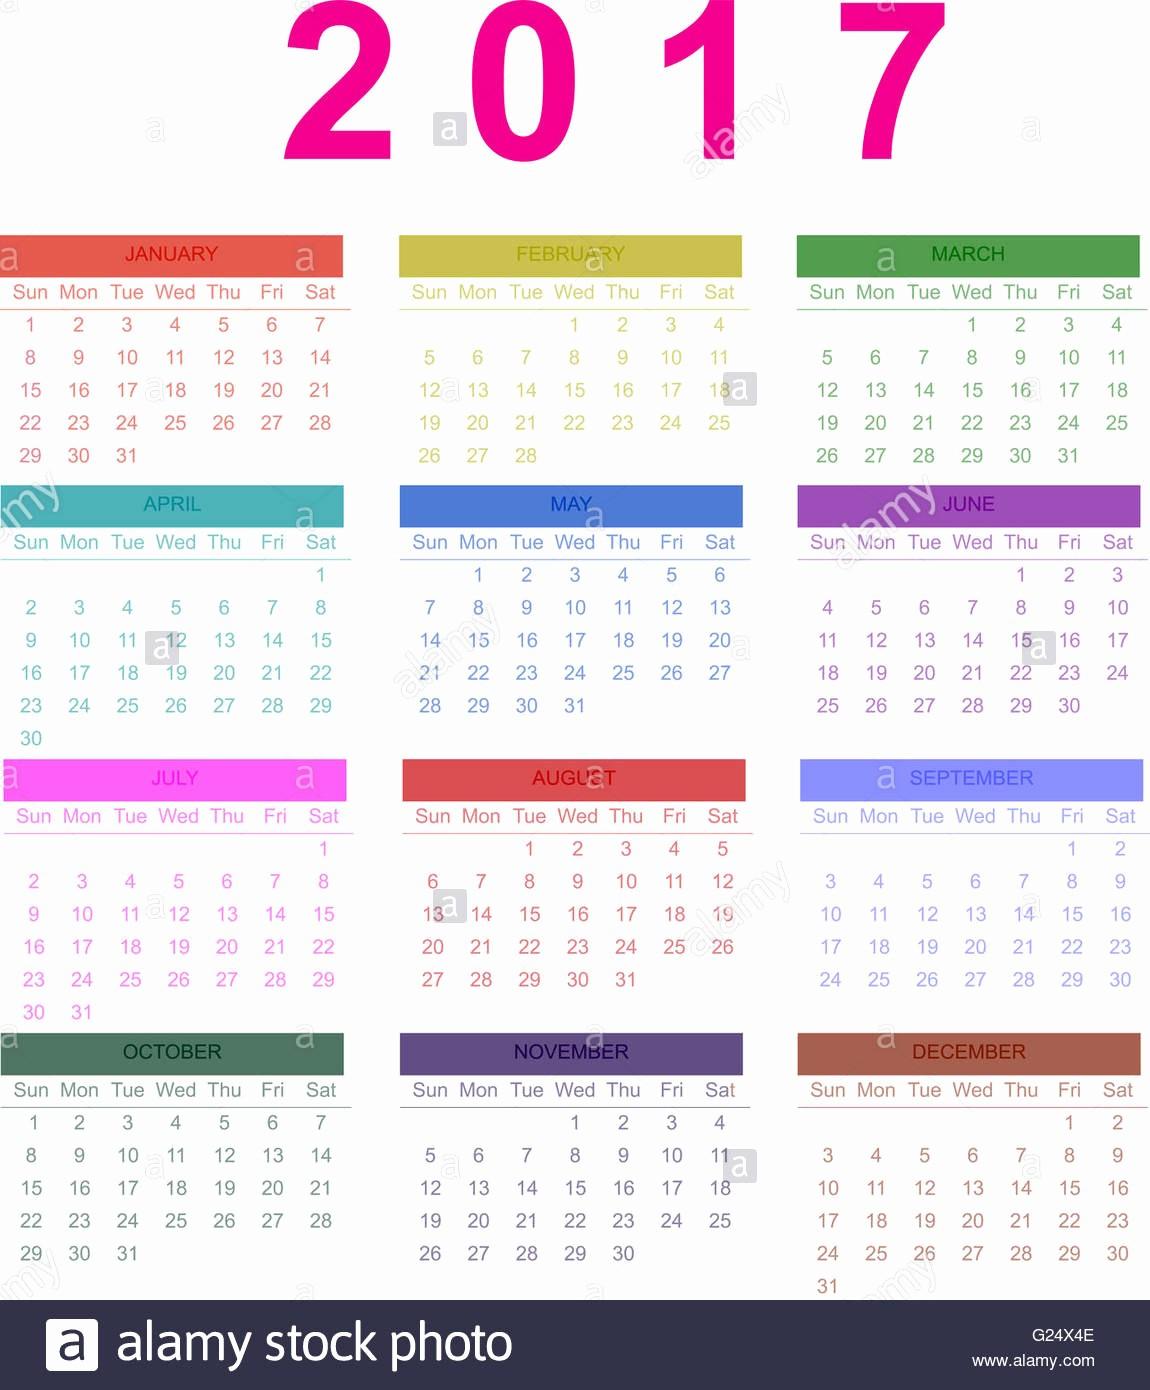 2017 Calendar Month by Month Elegant Calendar 2017 Monthly Calendar Of 2017 Stock